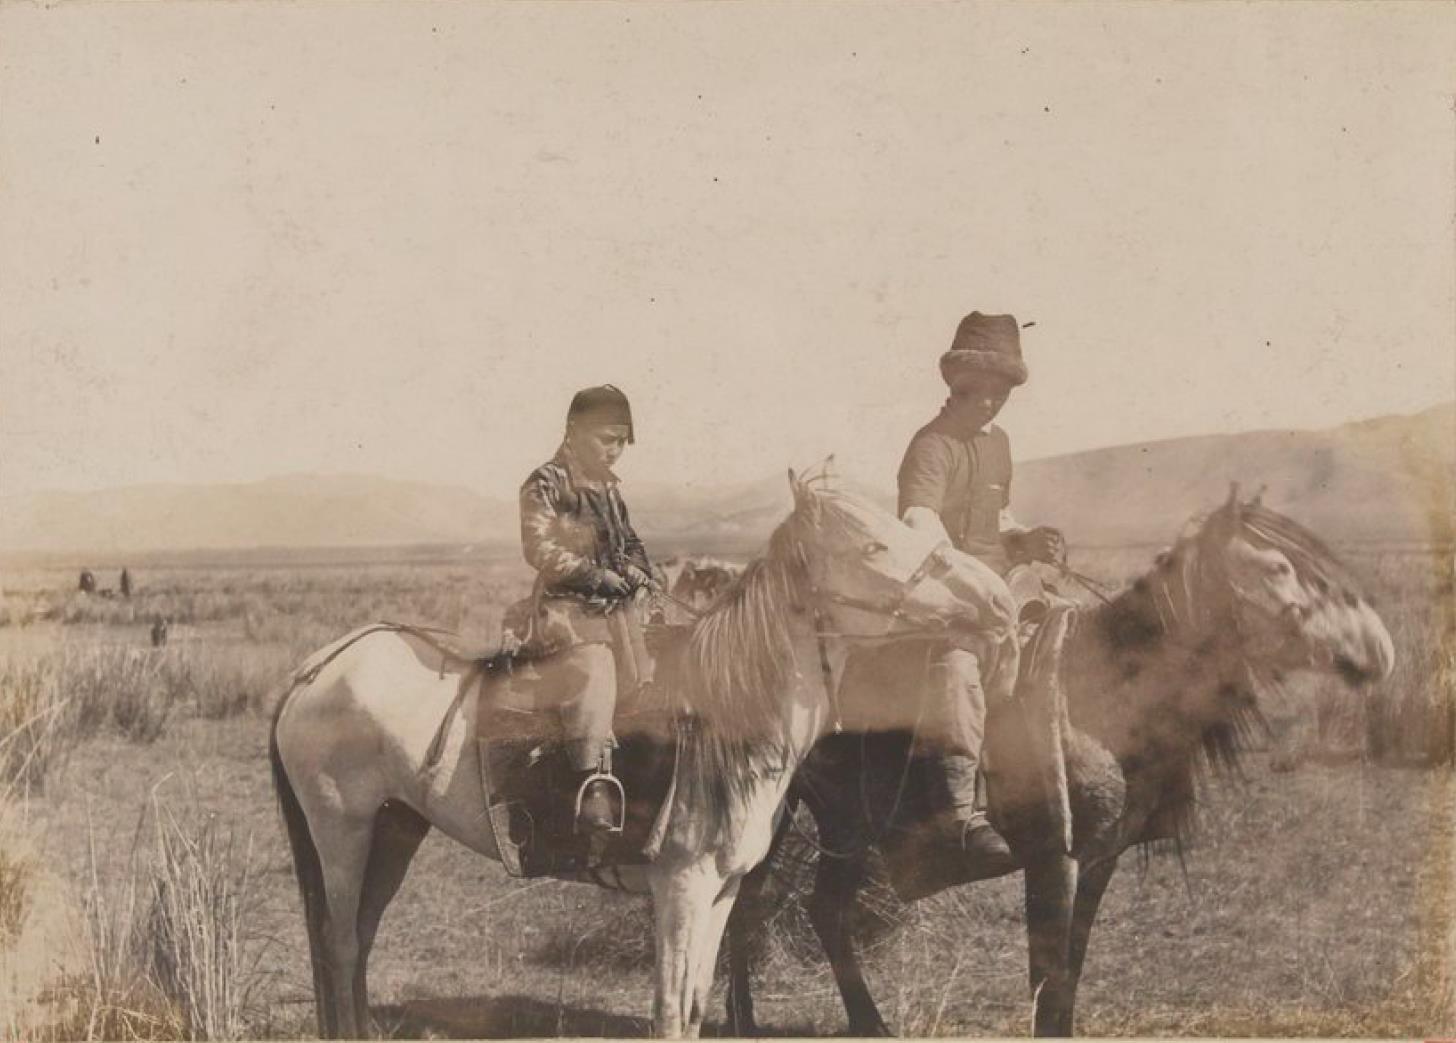 Киргизы Семипалатинской области. Жених